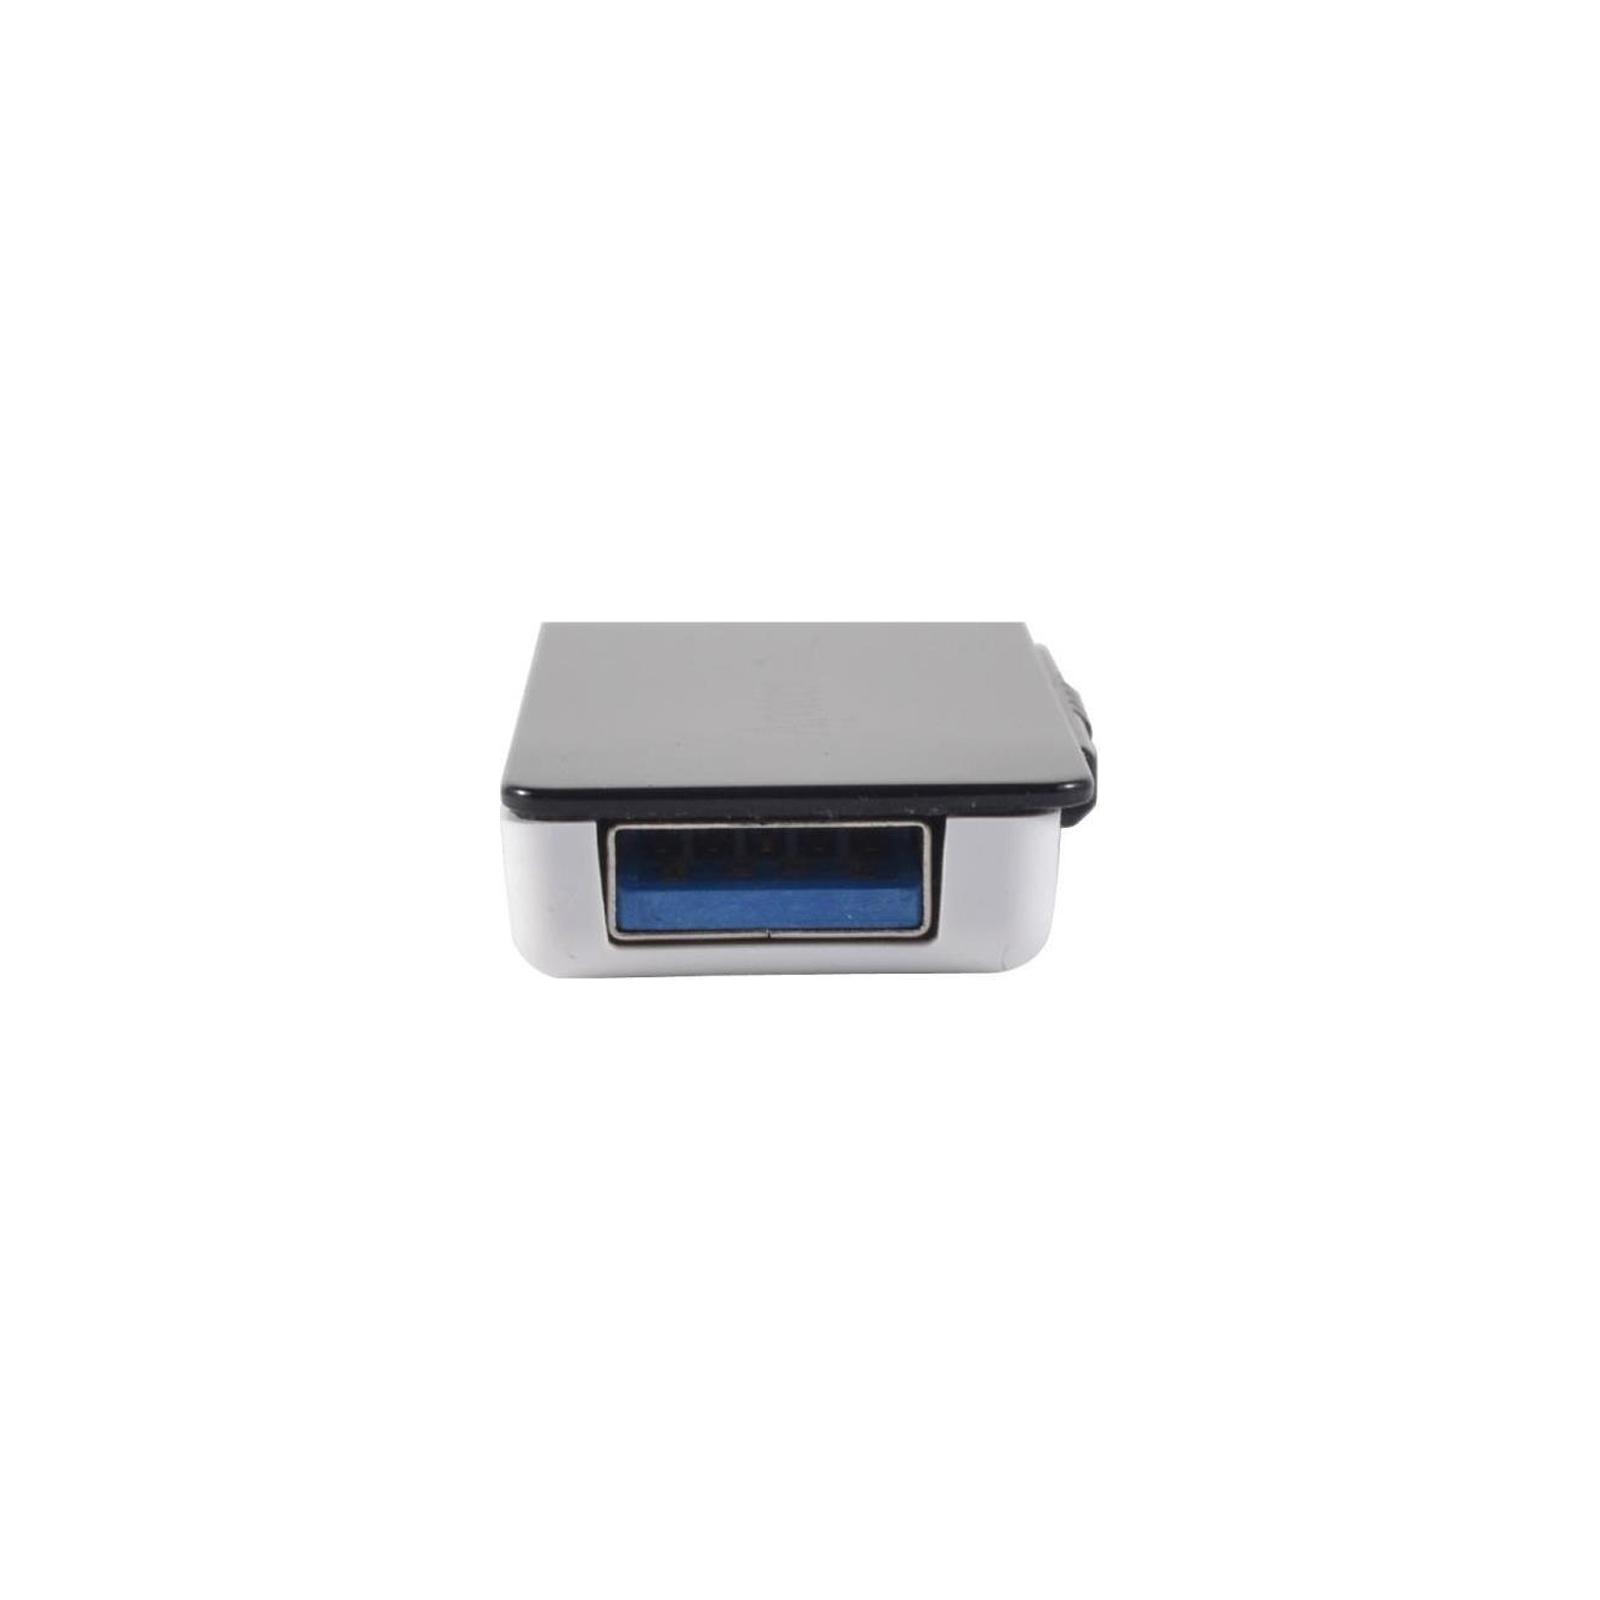 USB флеш накопитель 16GB AH350 Black RP USB3.0 Apacer (AP16GAH350B-1) изображение 7